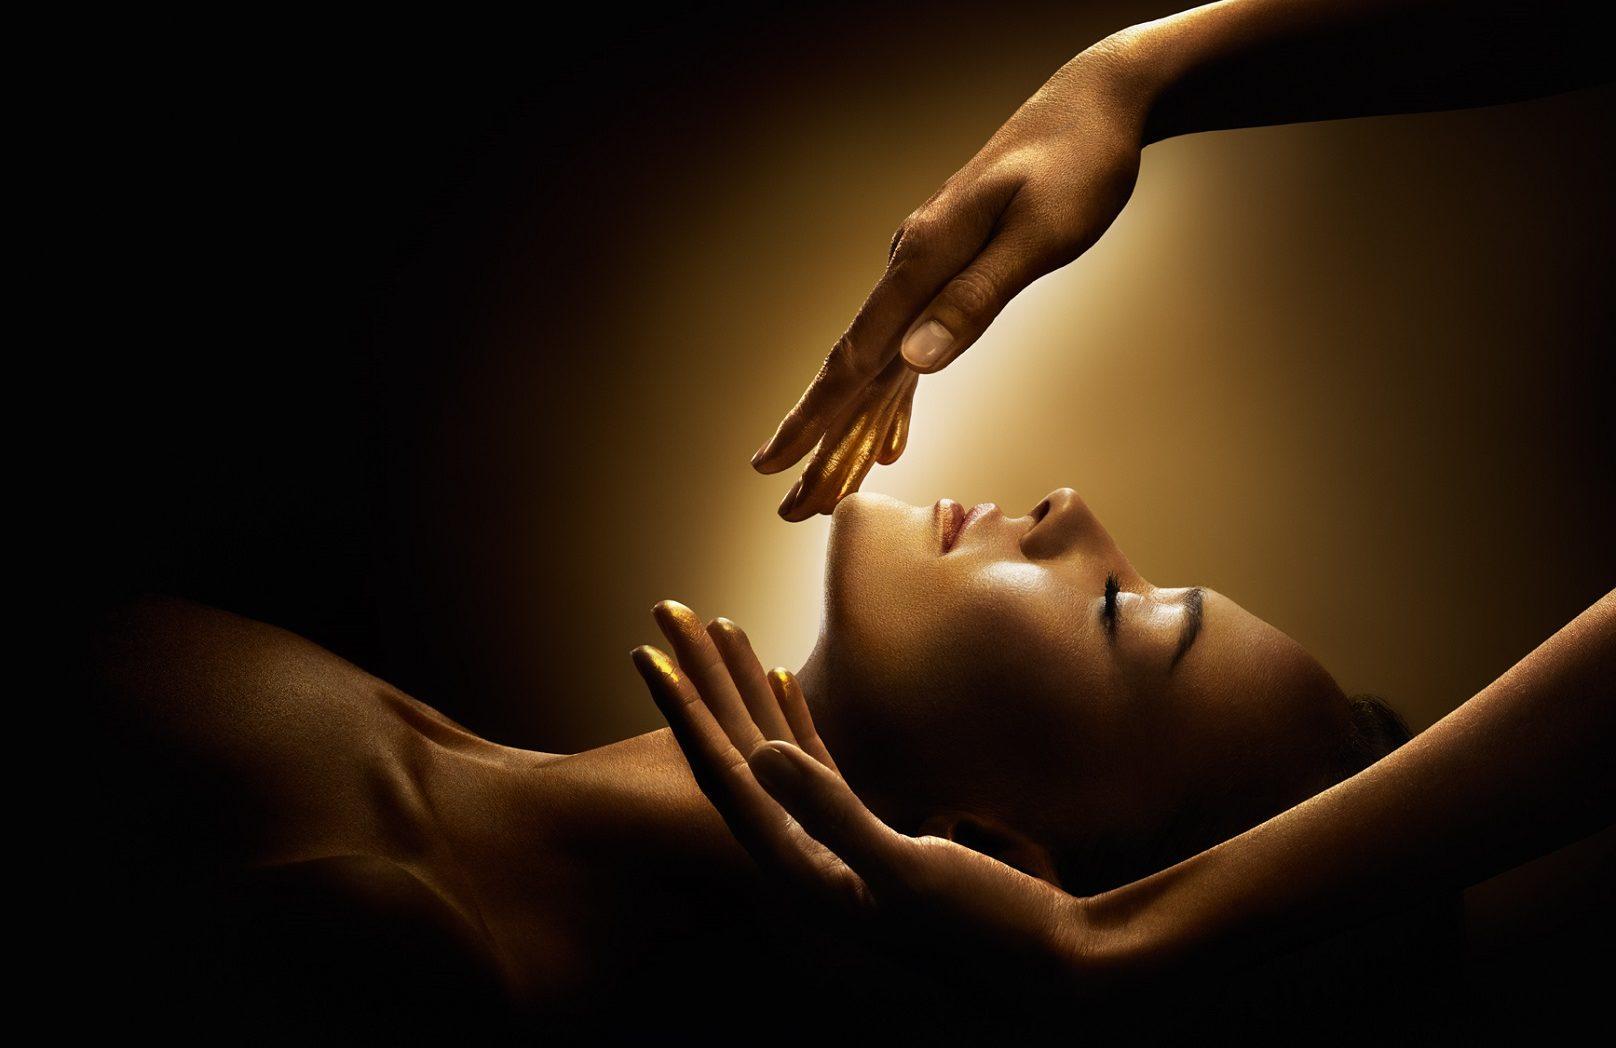 Decleor Face Massage at Peake Spa